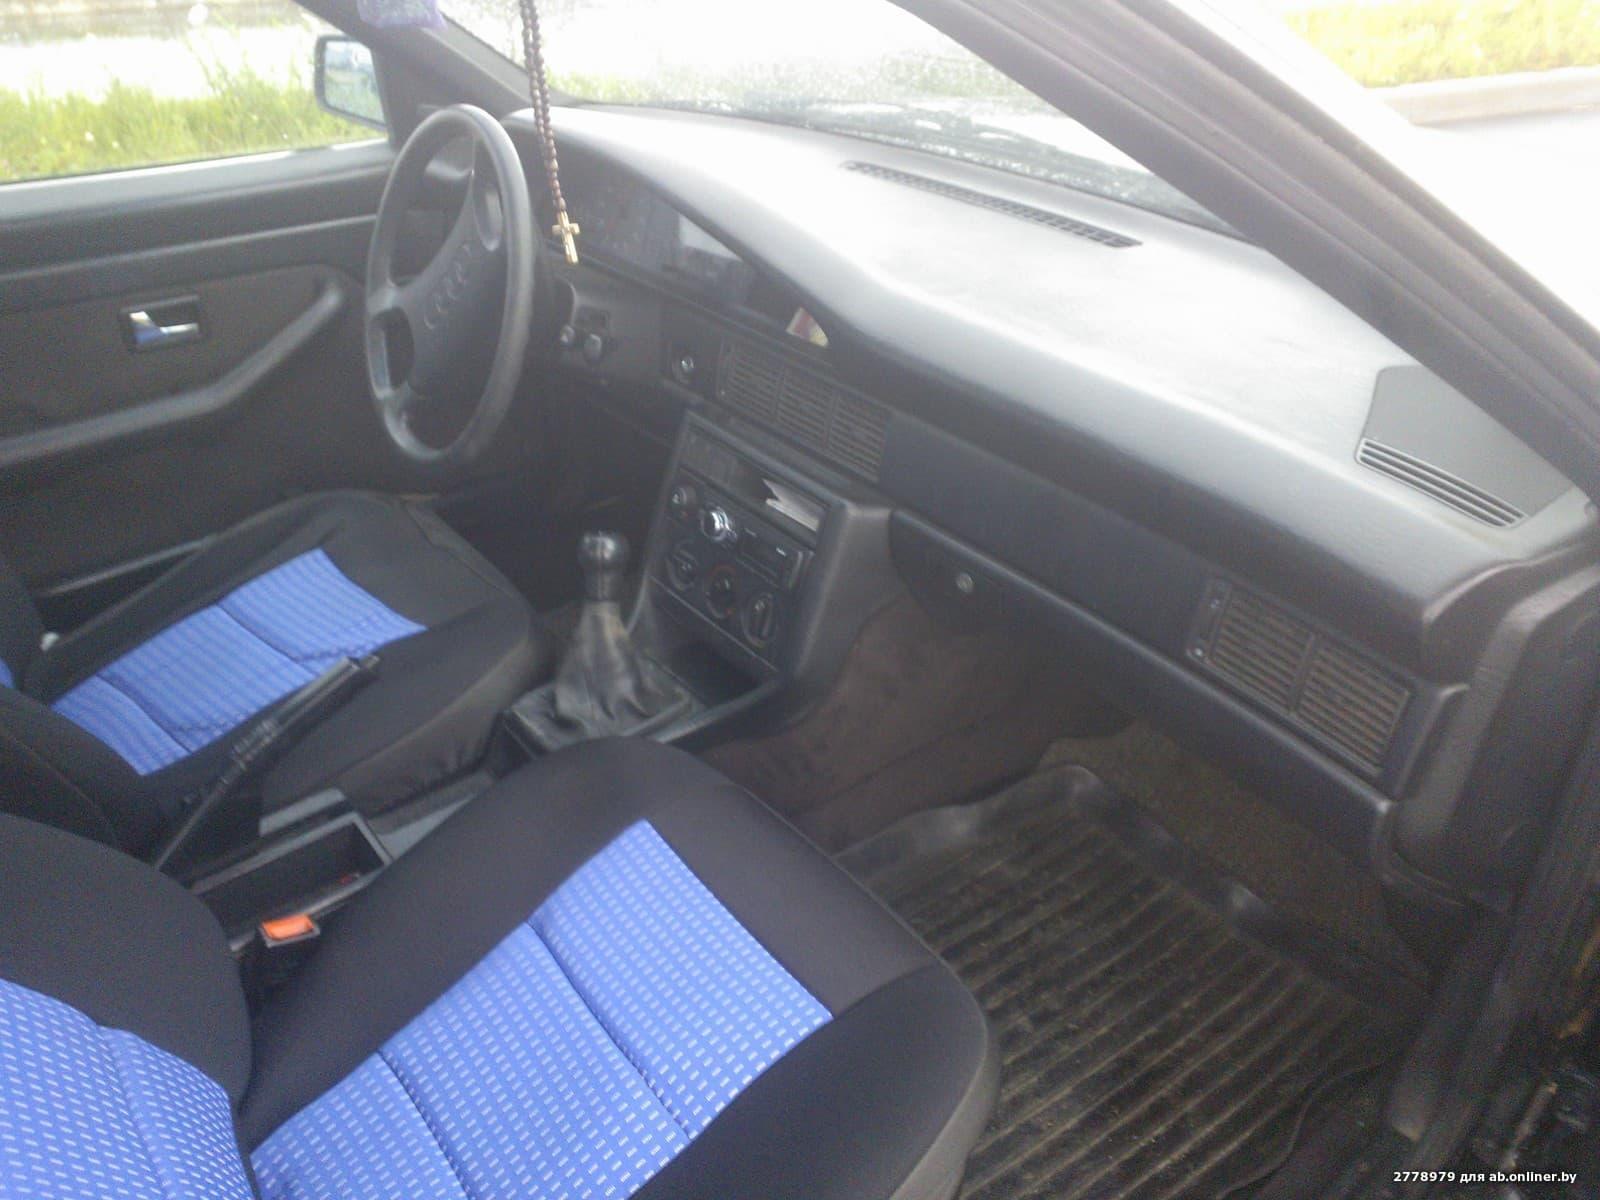 Audi 100 C3, рестайлинг